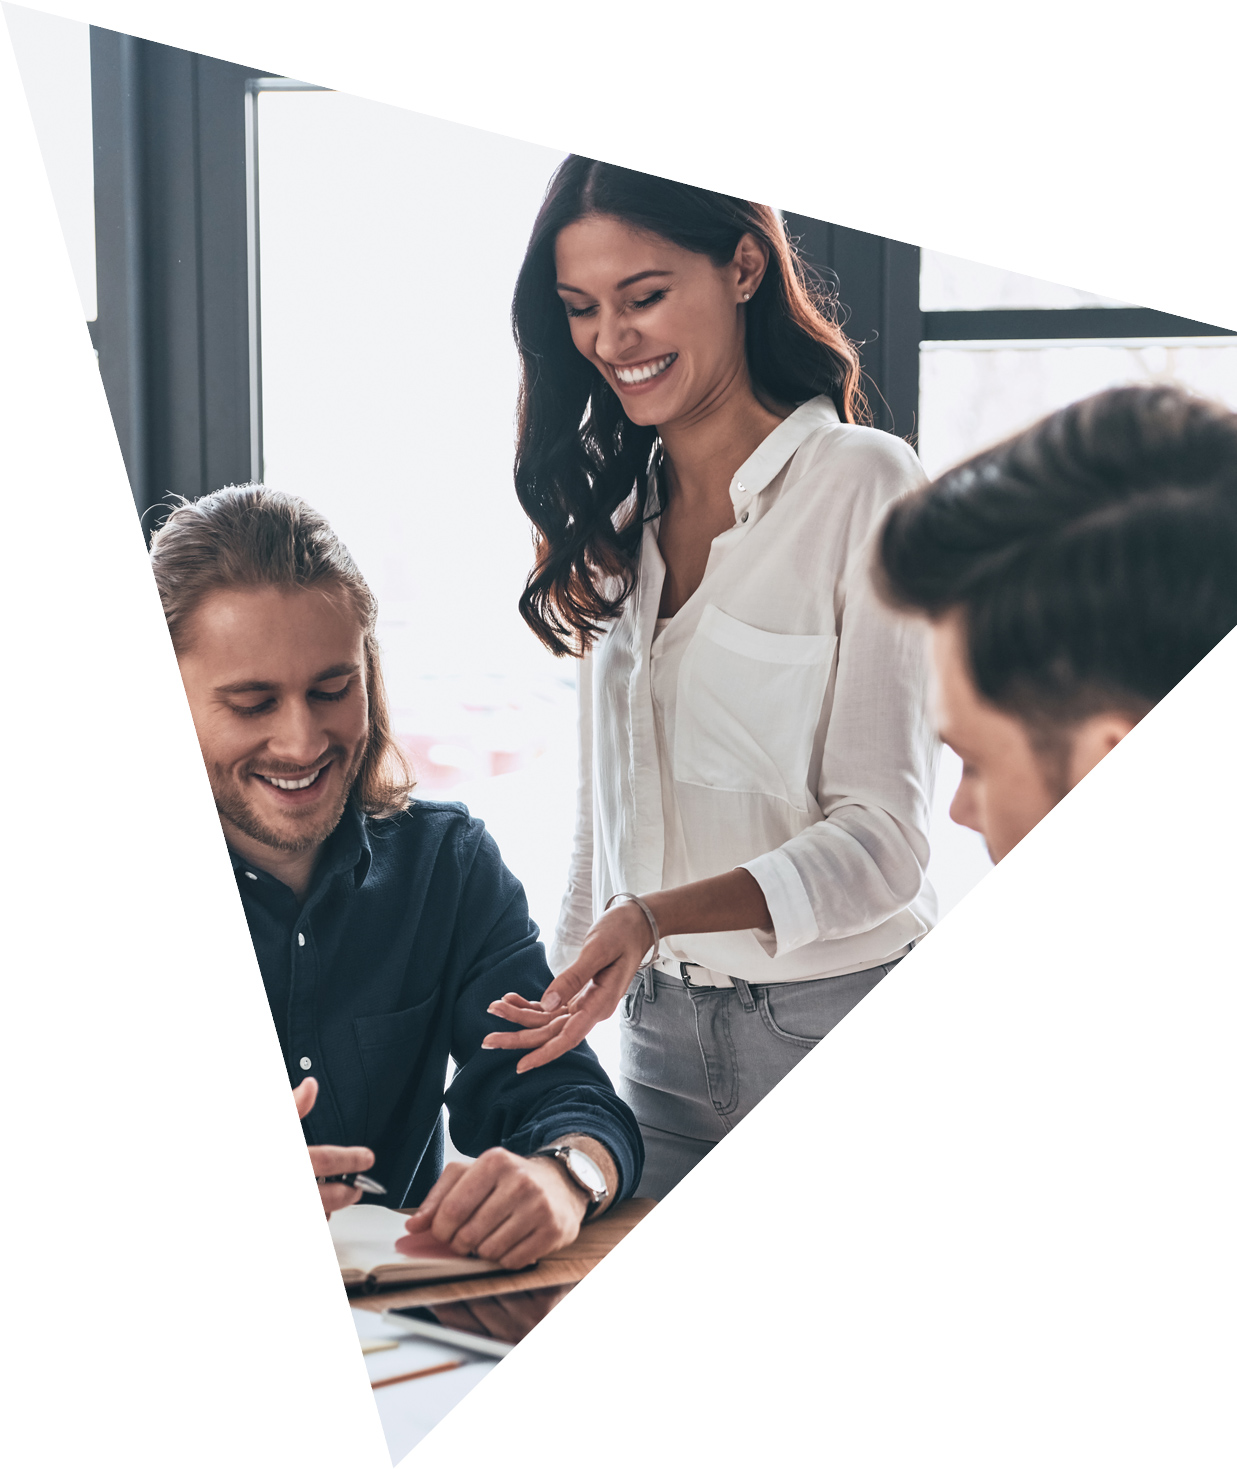 https://www.business-navigators.co.uk/wp-content/uploads/2020/07/leadership.jpg